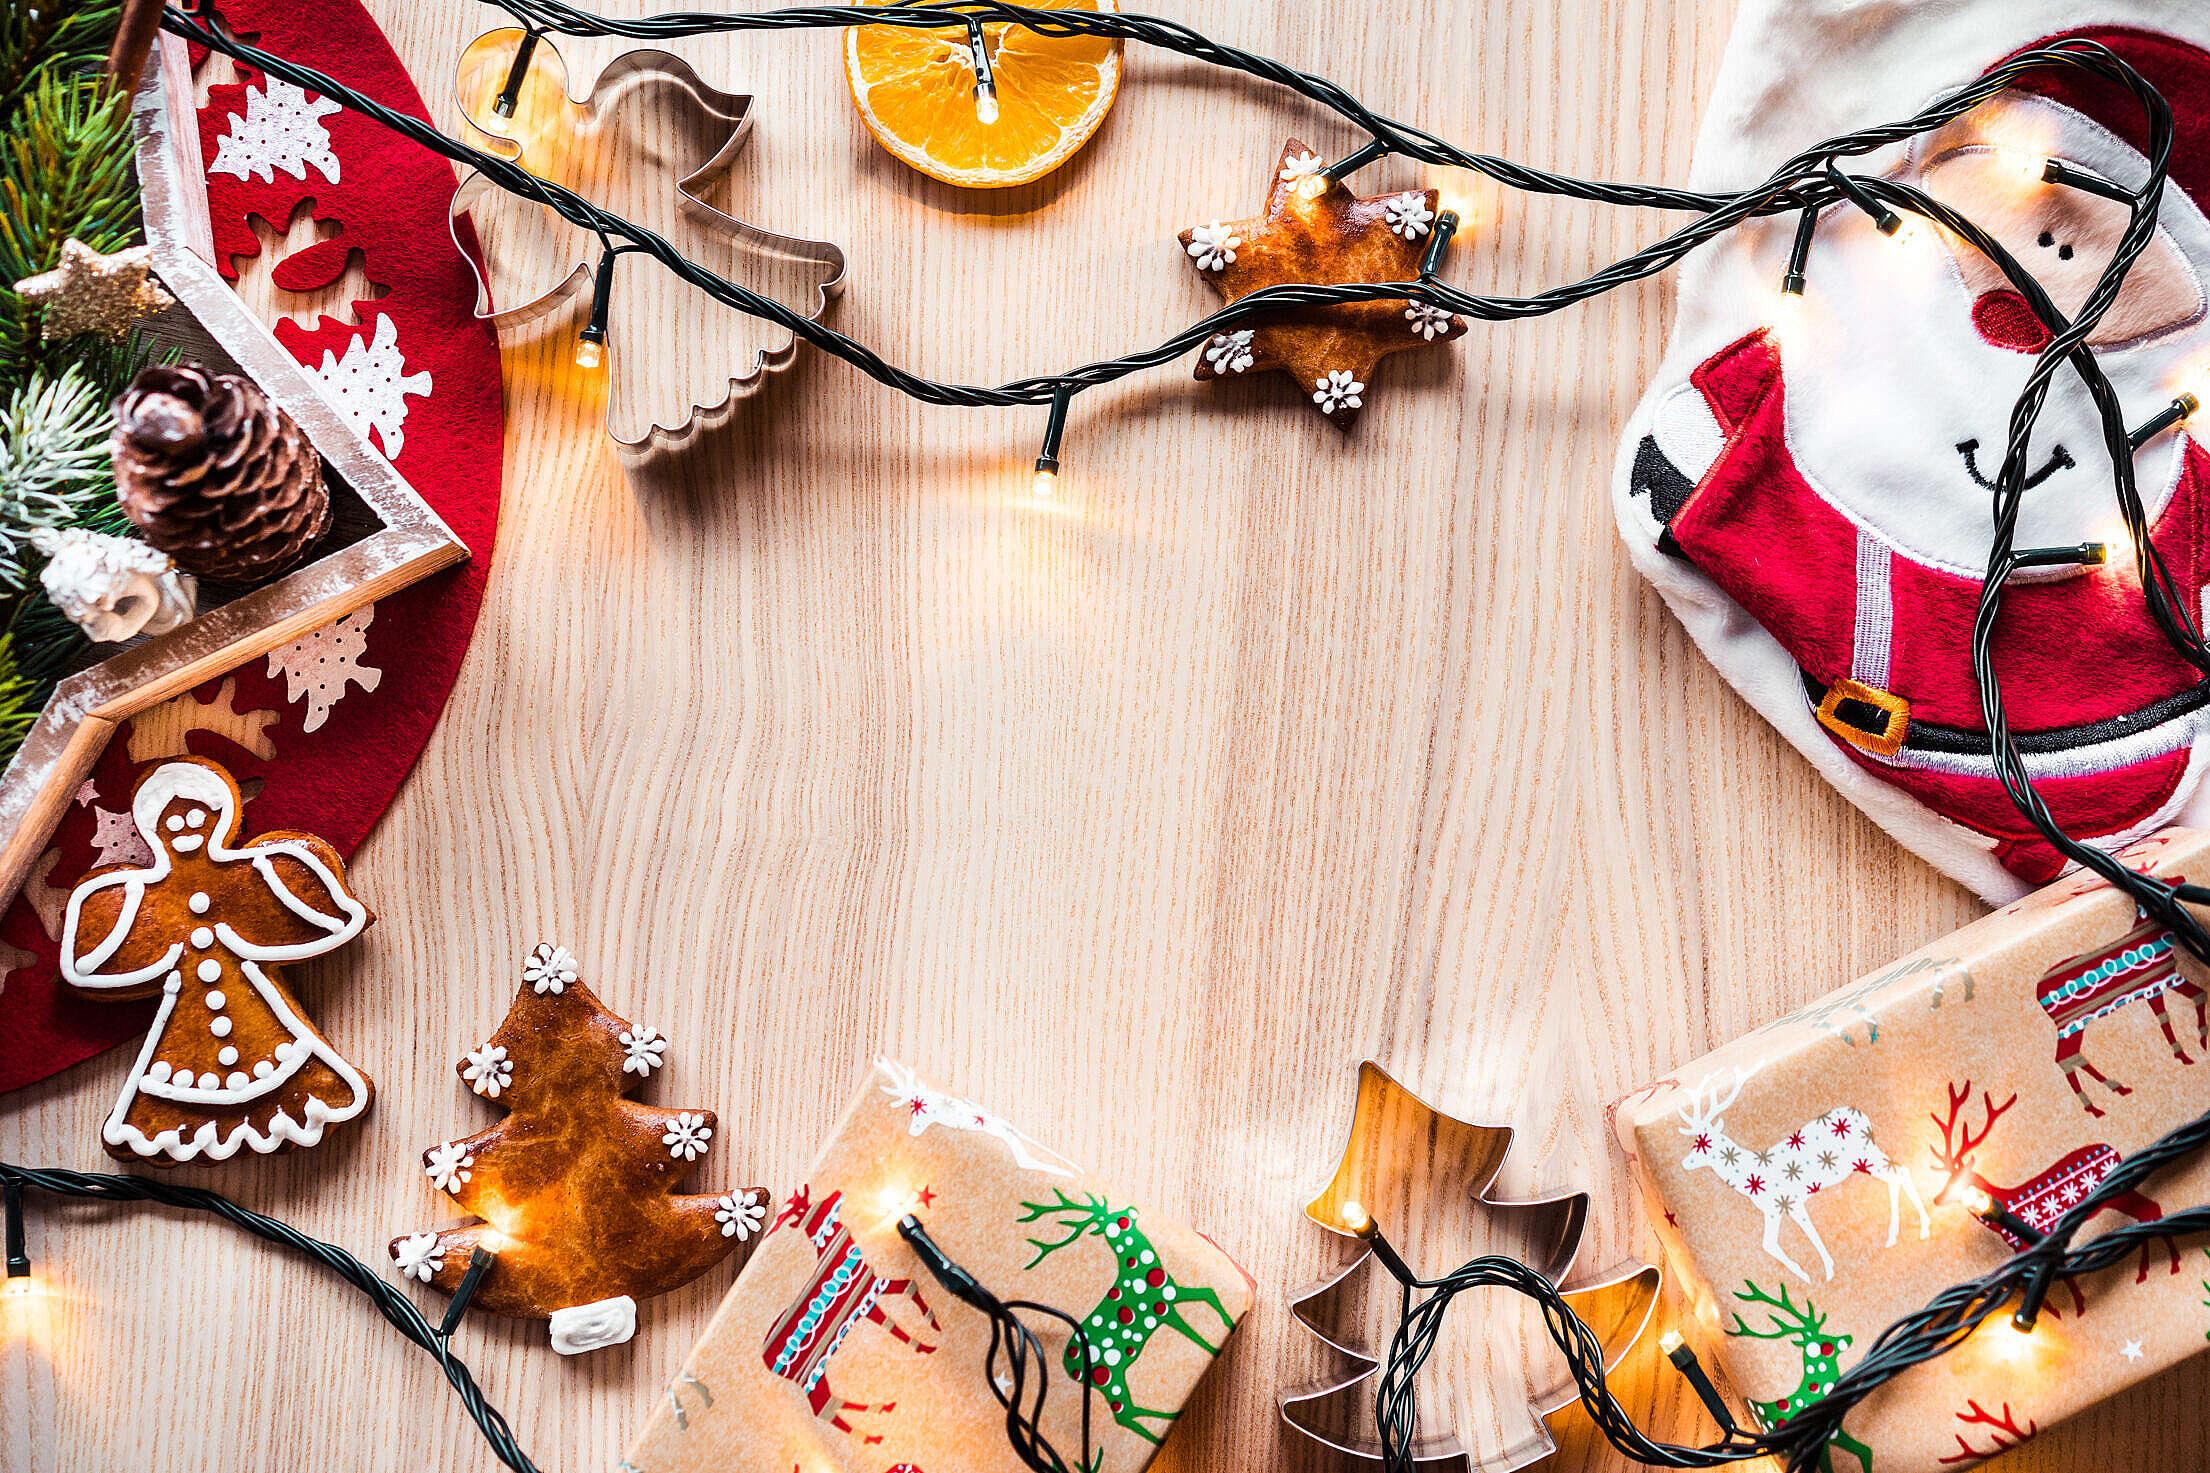 Christmas Time Decorations Hero Background Image Free Stock Photo